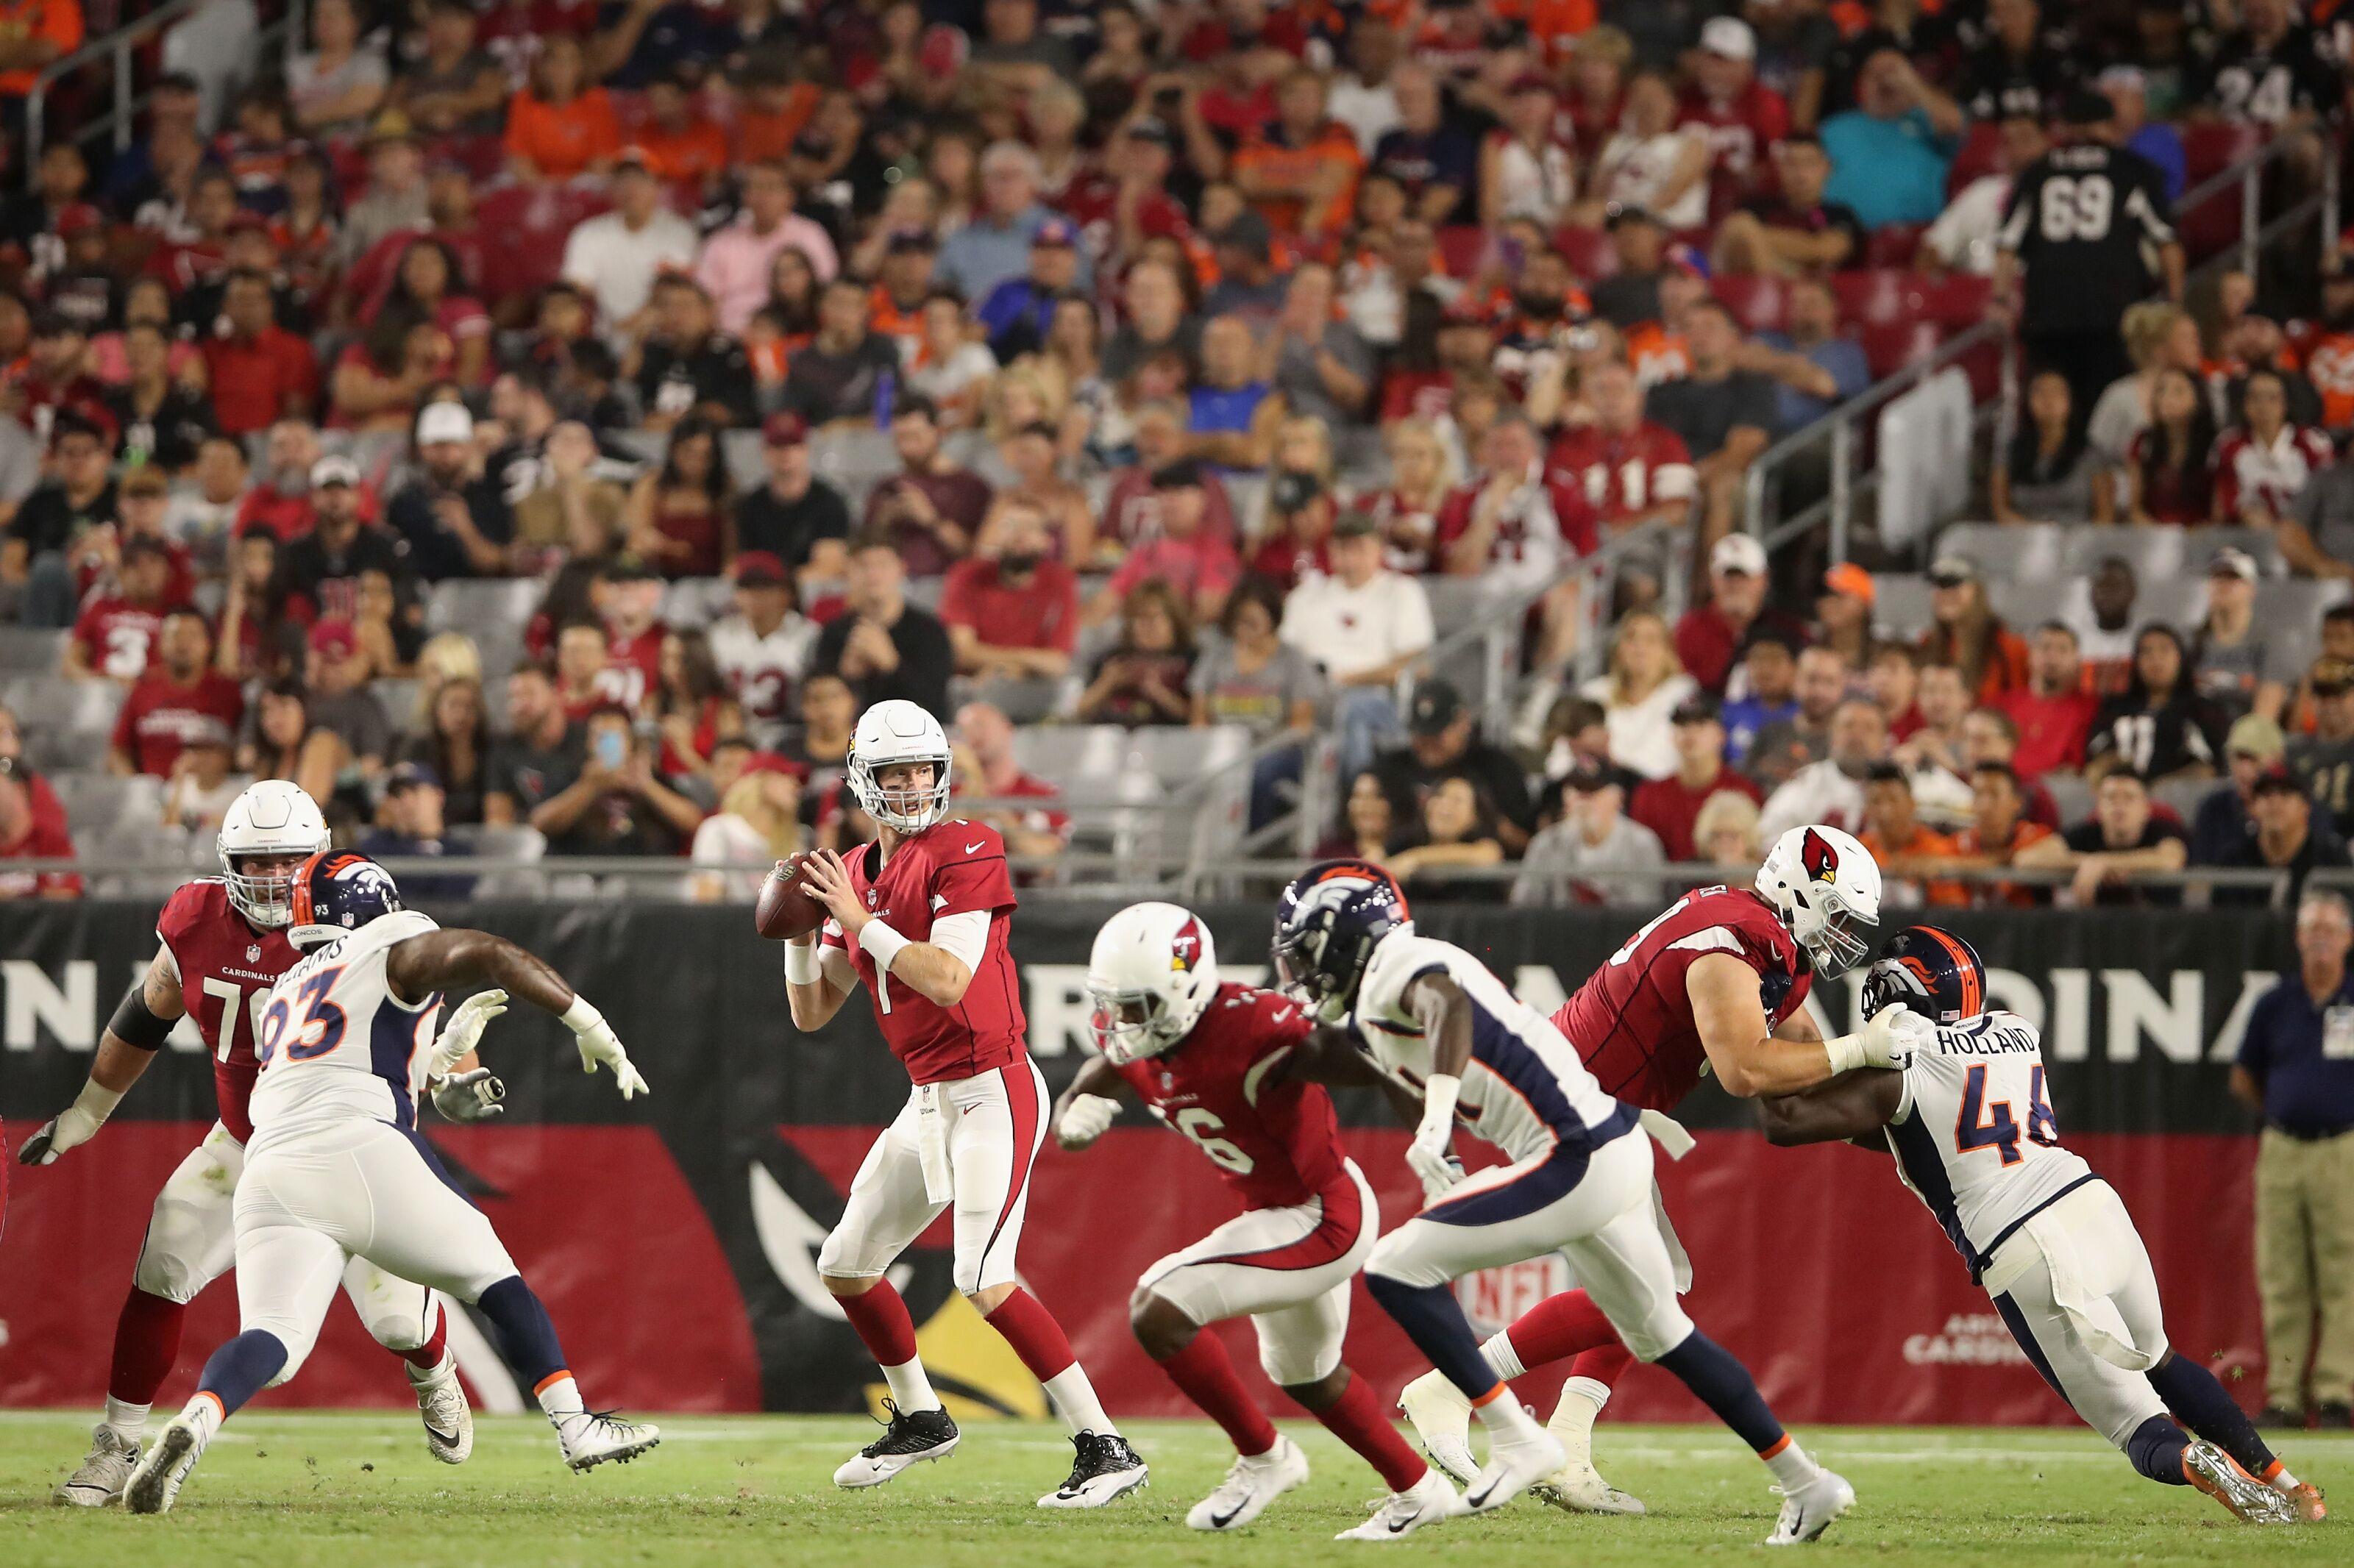 Flipboard Watch Thursday Night Football Tonight On Amazon Prime Broncos At Cardinals